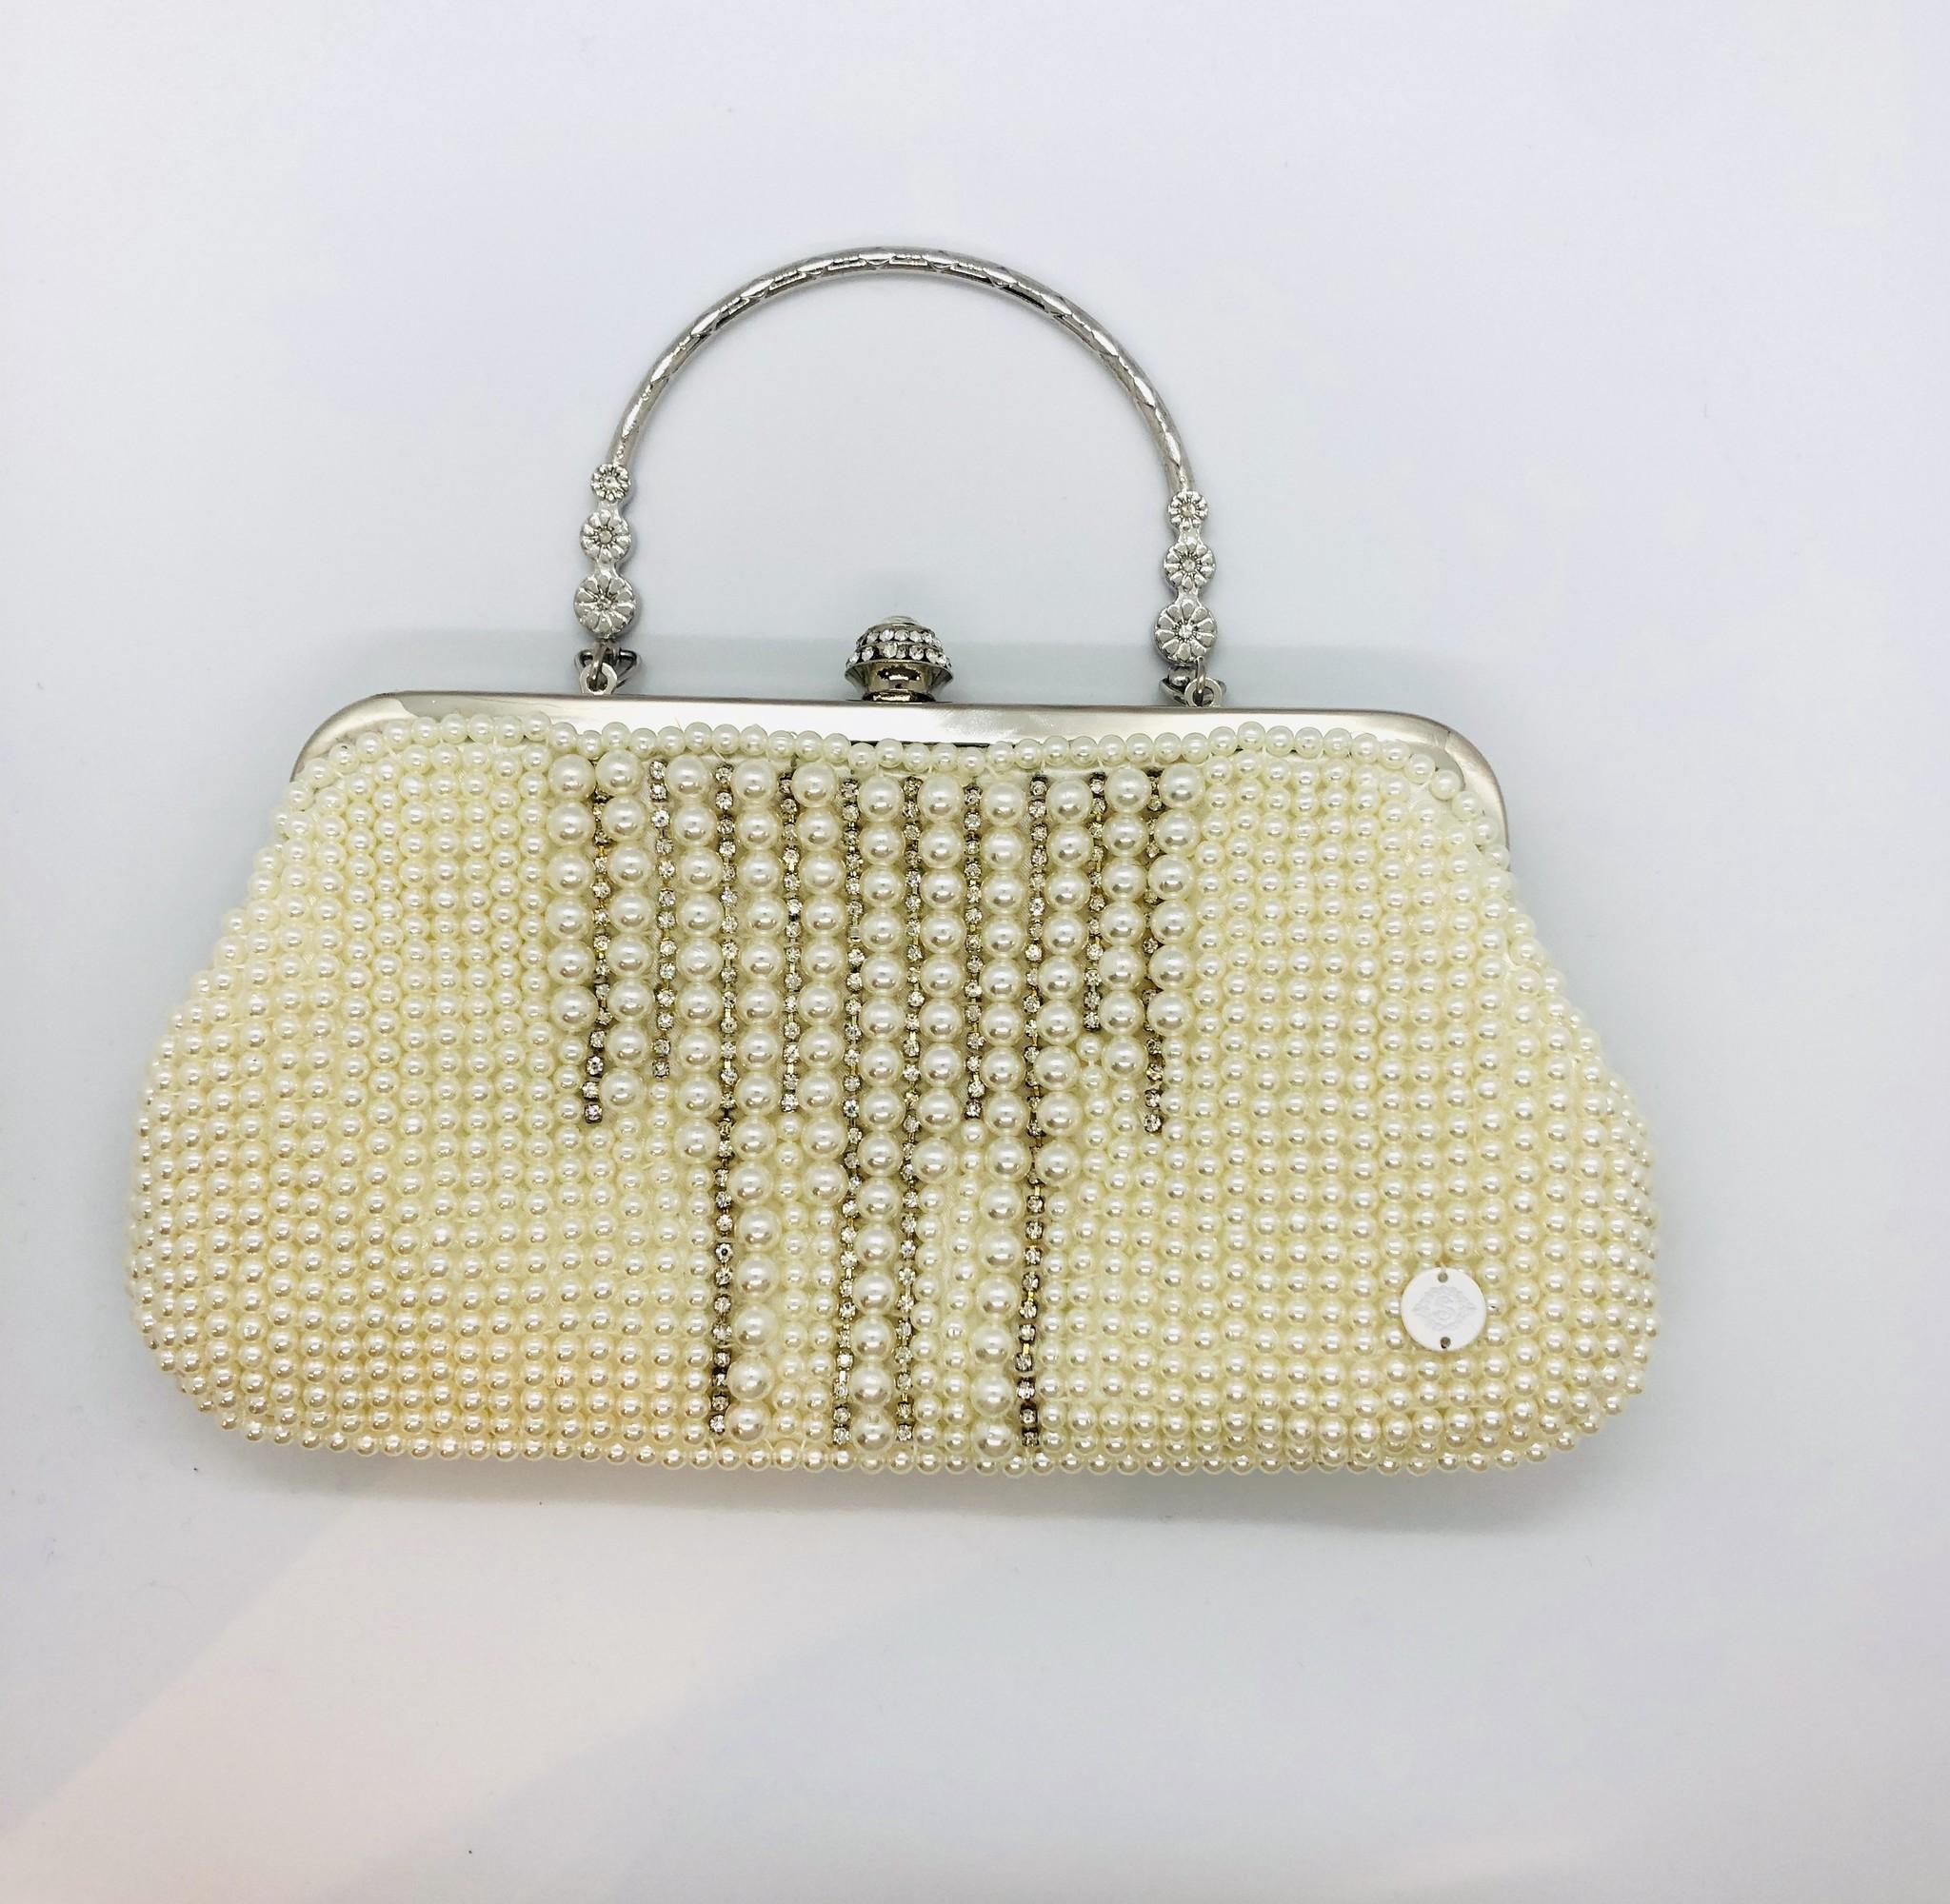 Sooley Designs Beaded Pearl Evening Bag